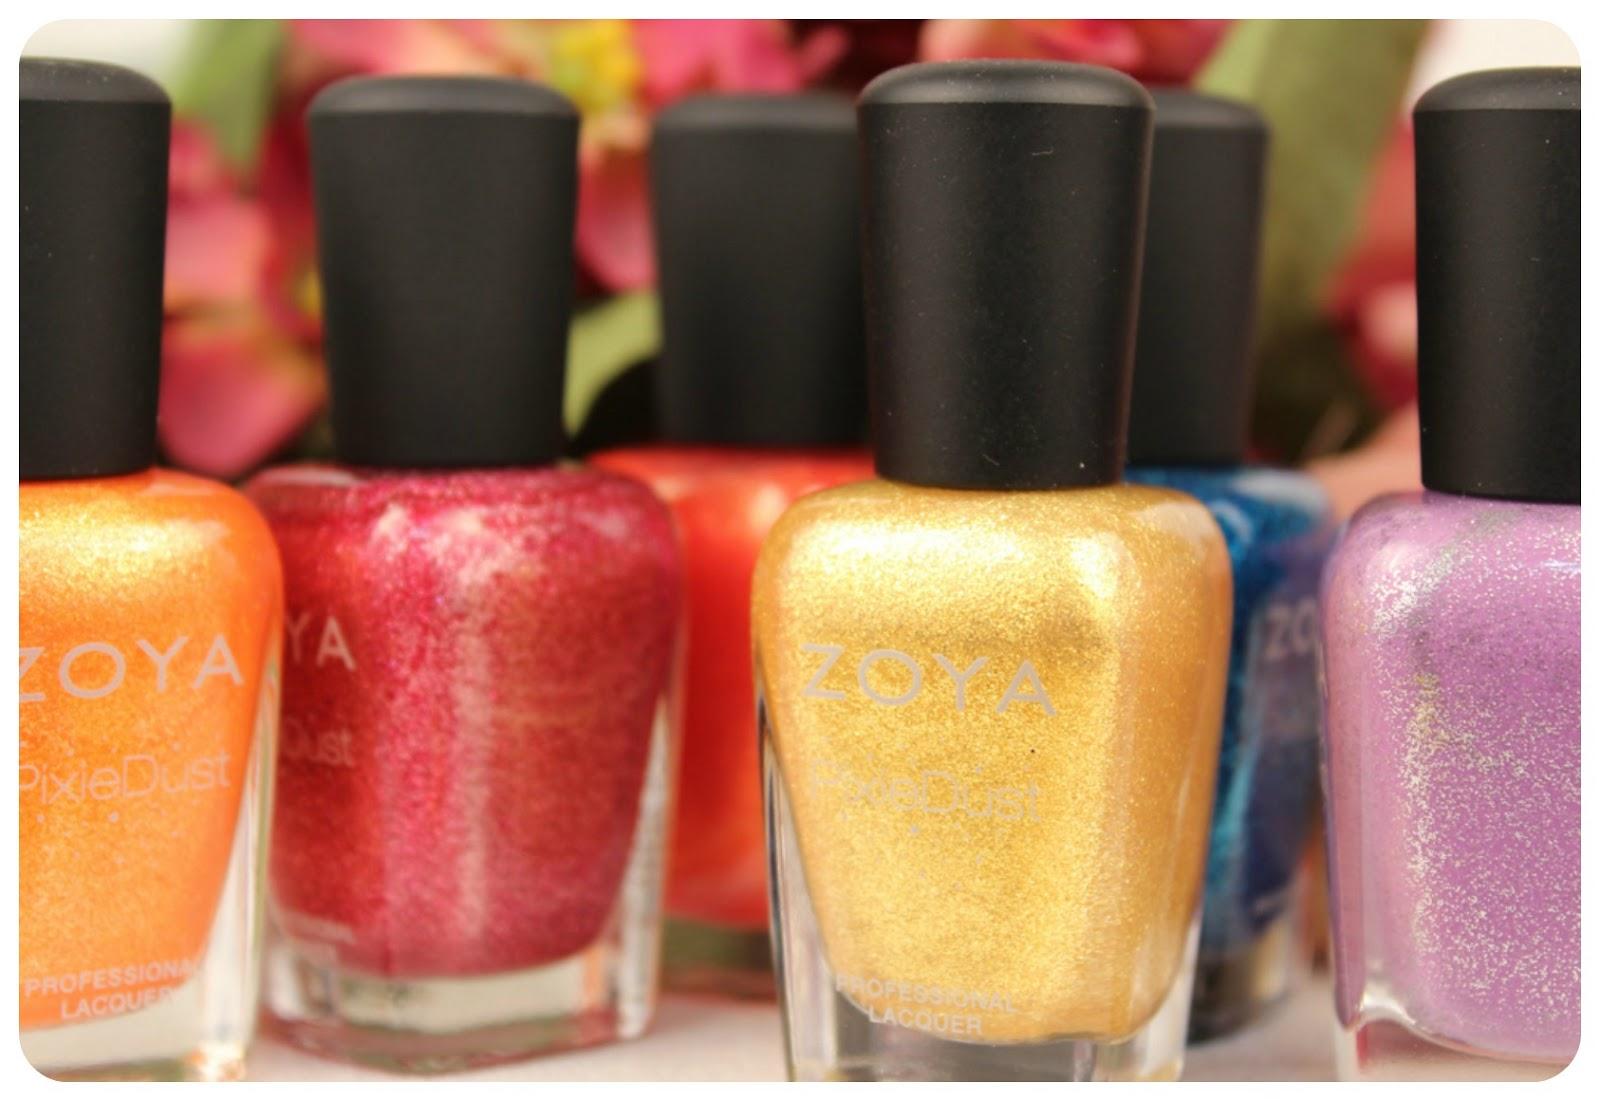 Fun Fierce Fabulous Beauty Over 50!: Nails ~ Zoya Pixie Dust Nail ...